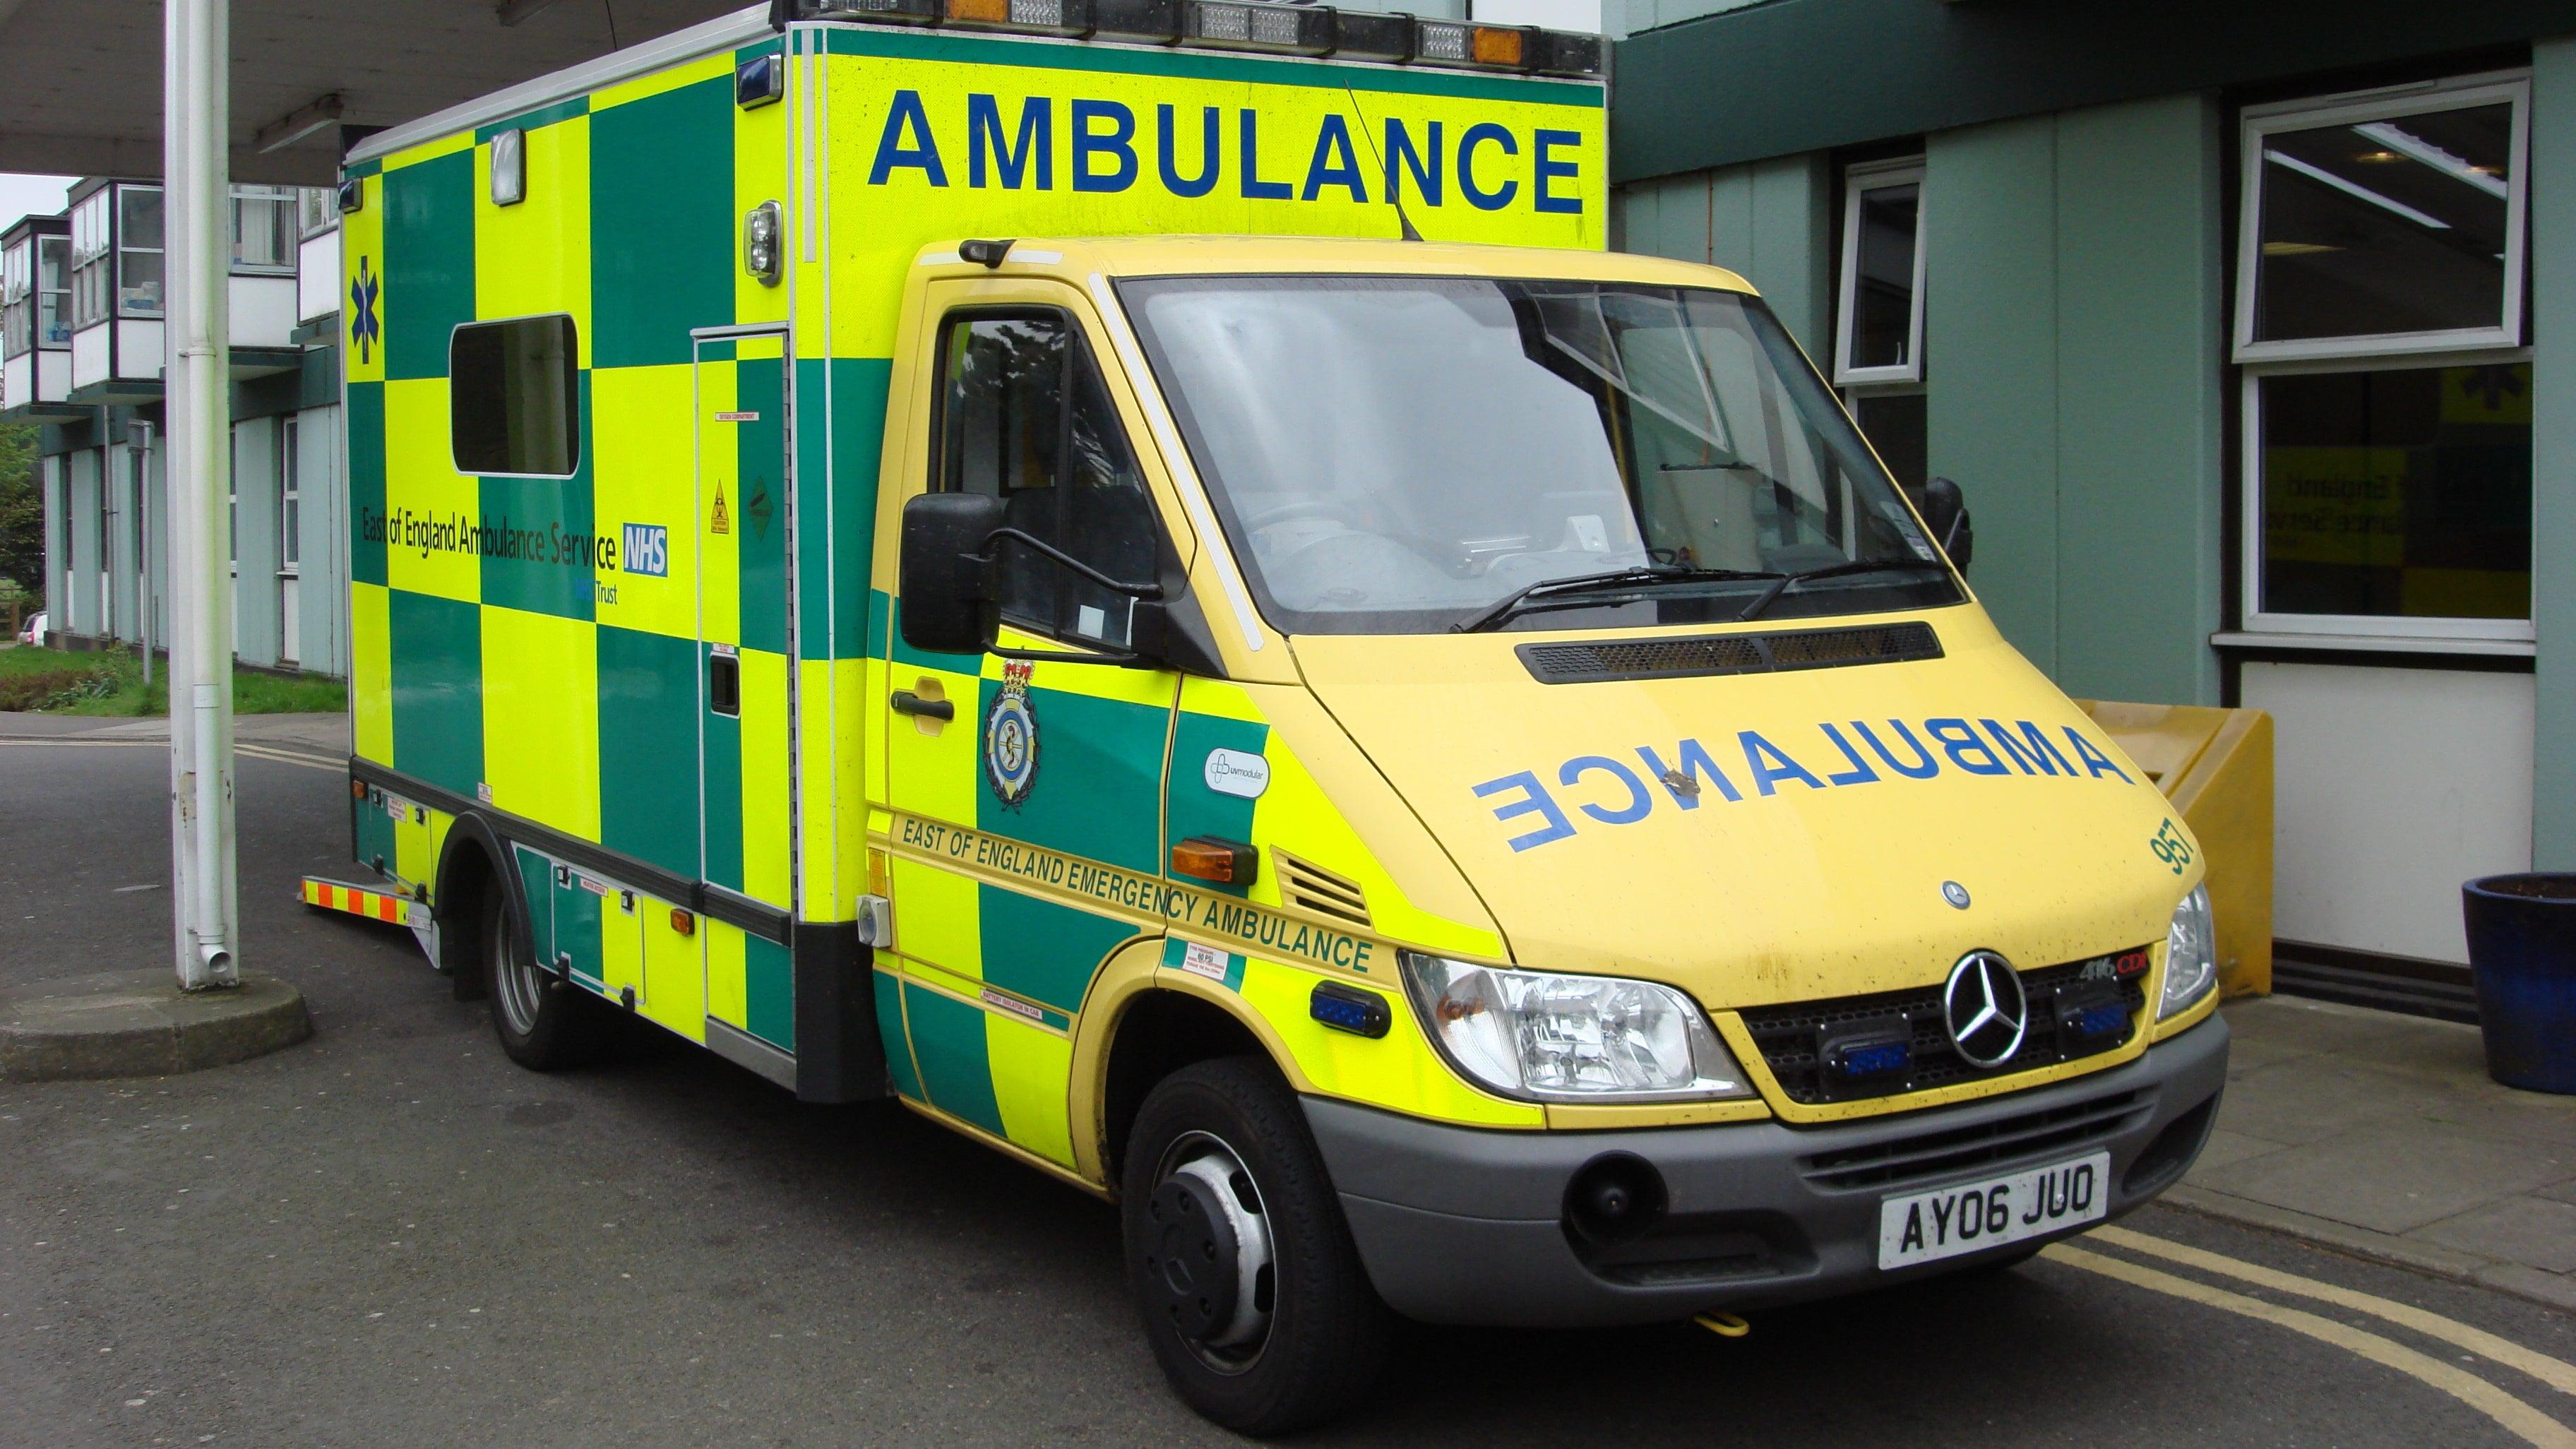 Medical Drones Could Beat Ambulances At Saving Cardiac Arrest Patients